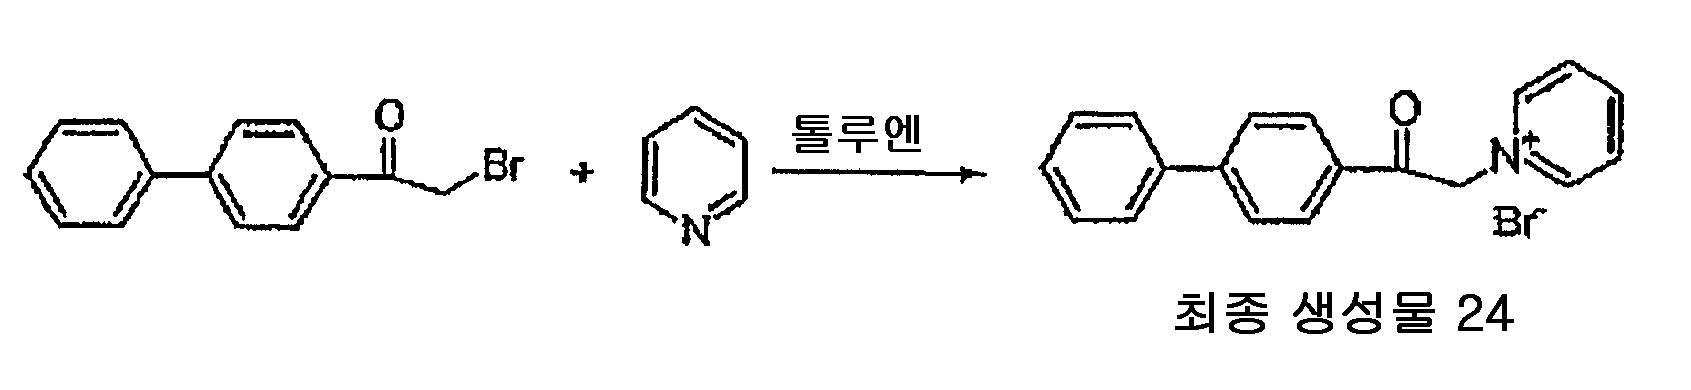 Figure 112010002231902-pat00119